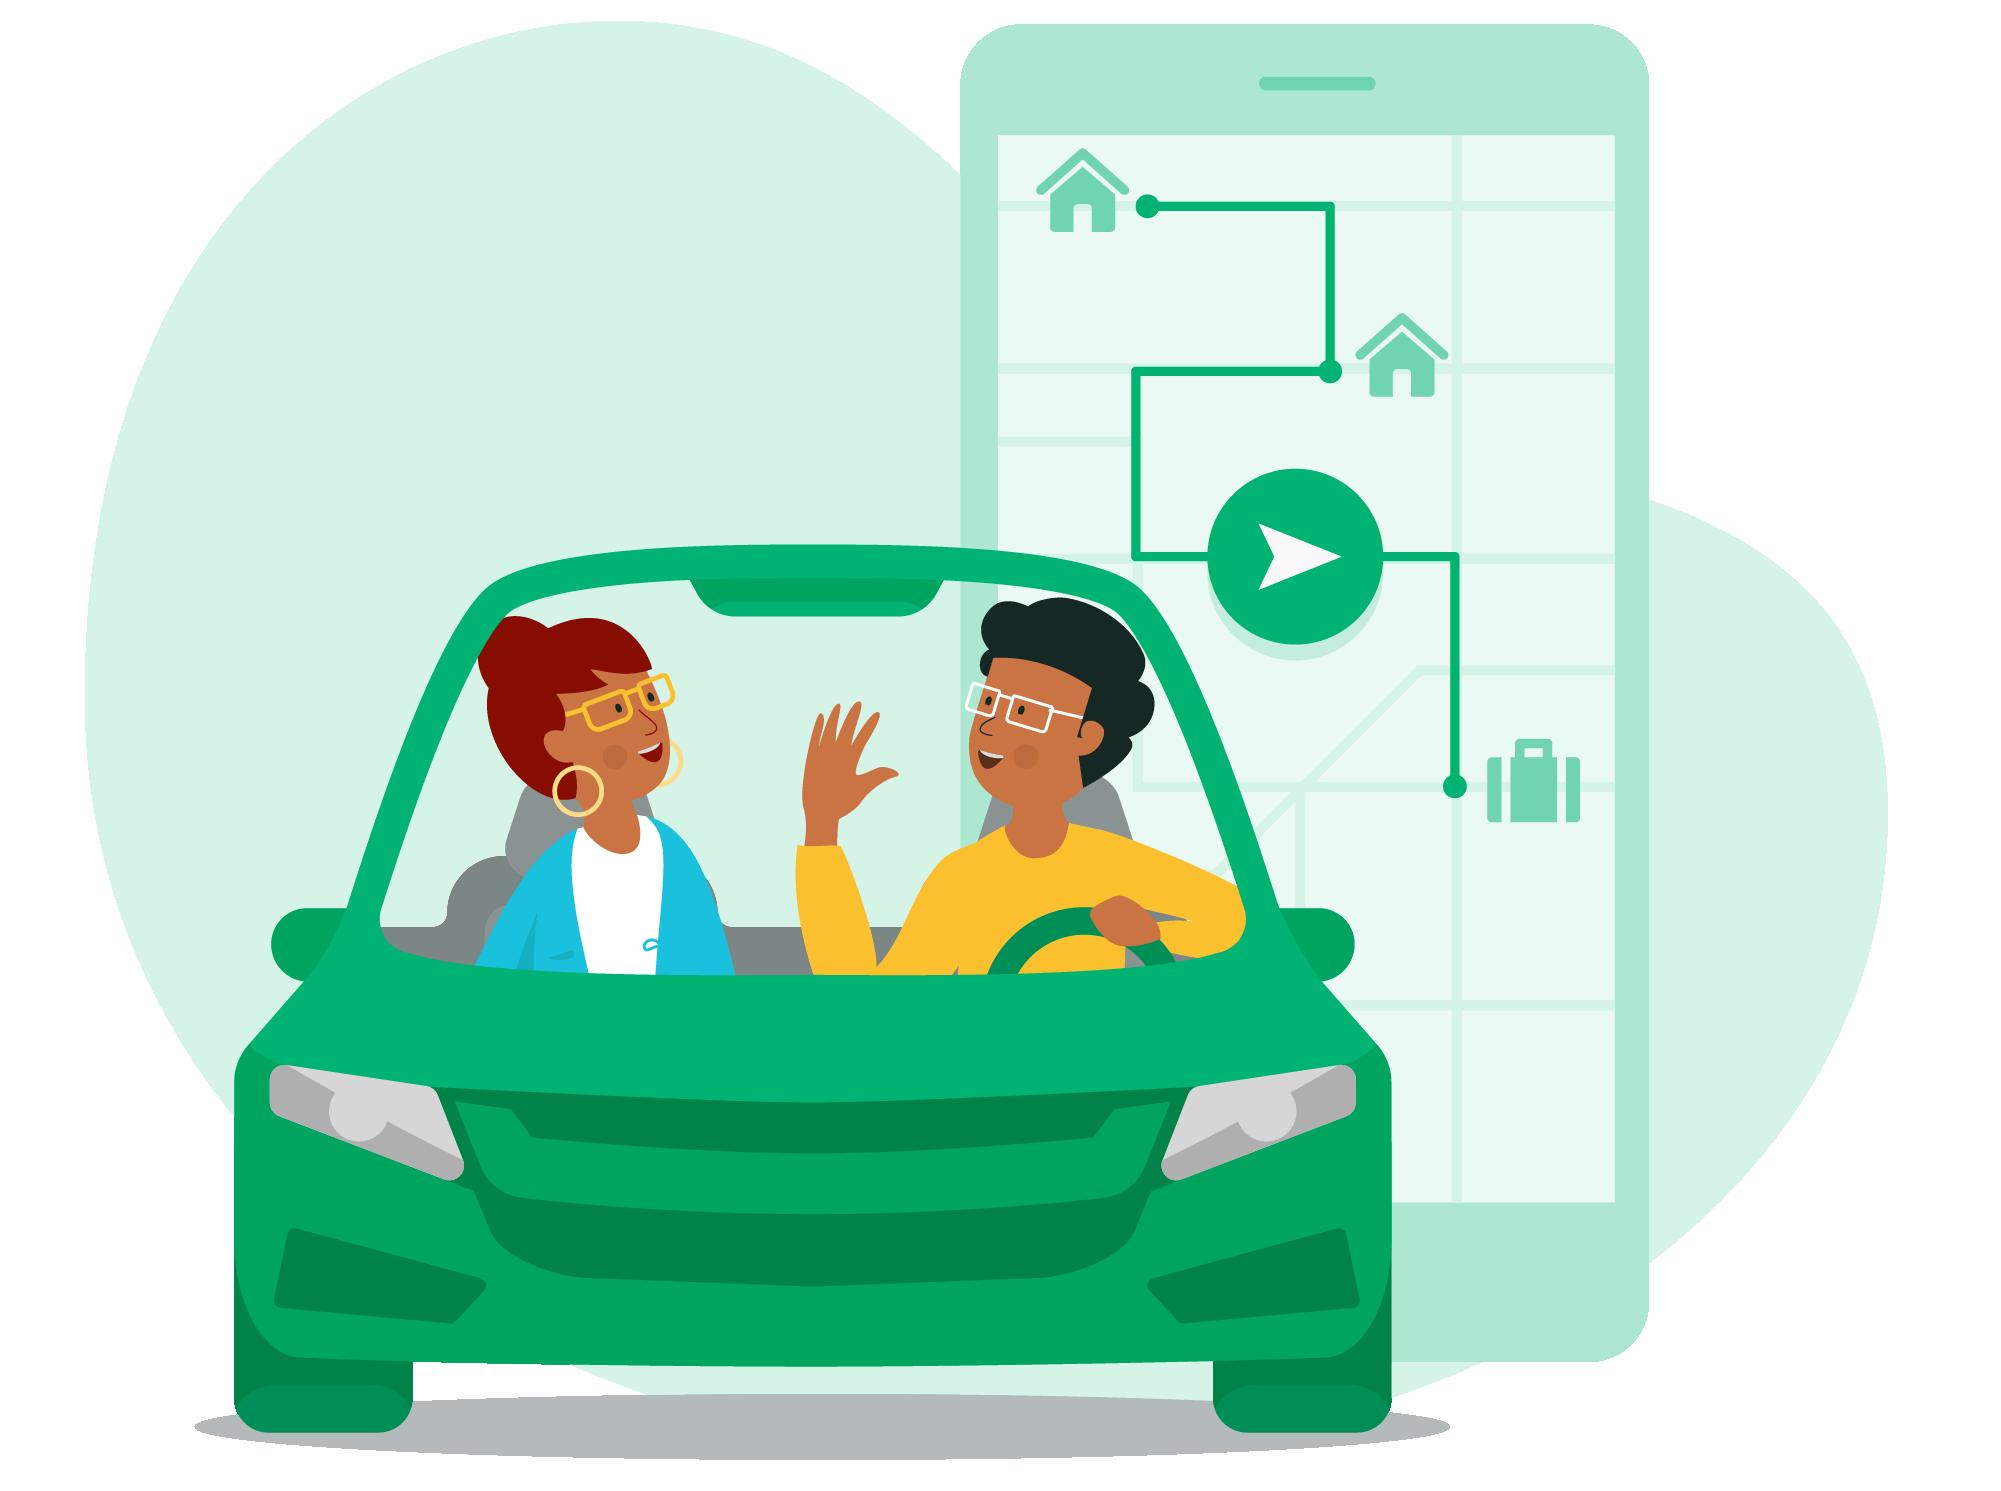 An illustration of a carpool trip.